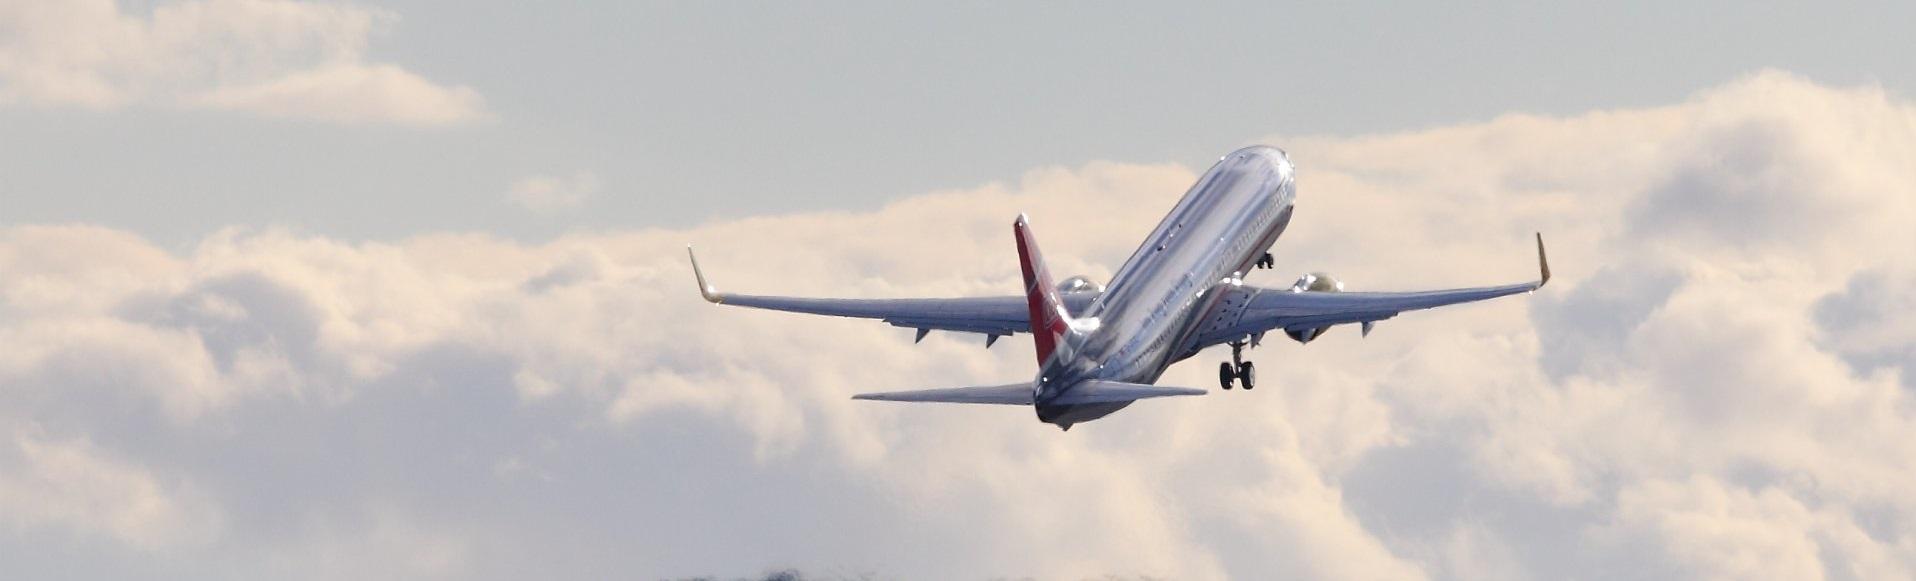 Titel_Flugzeug